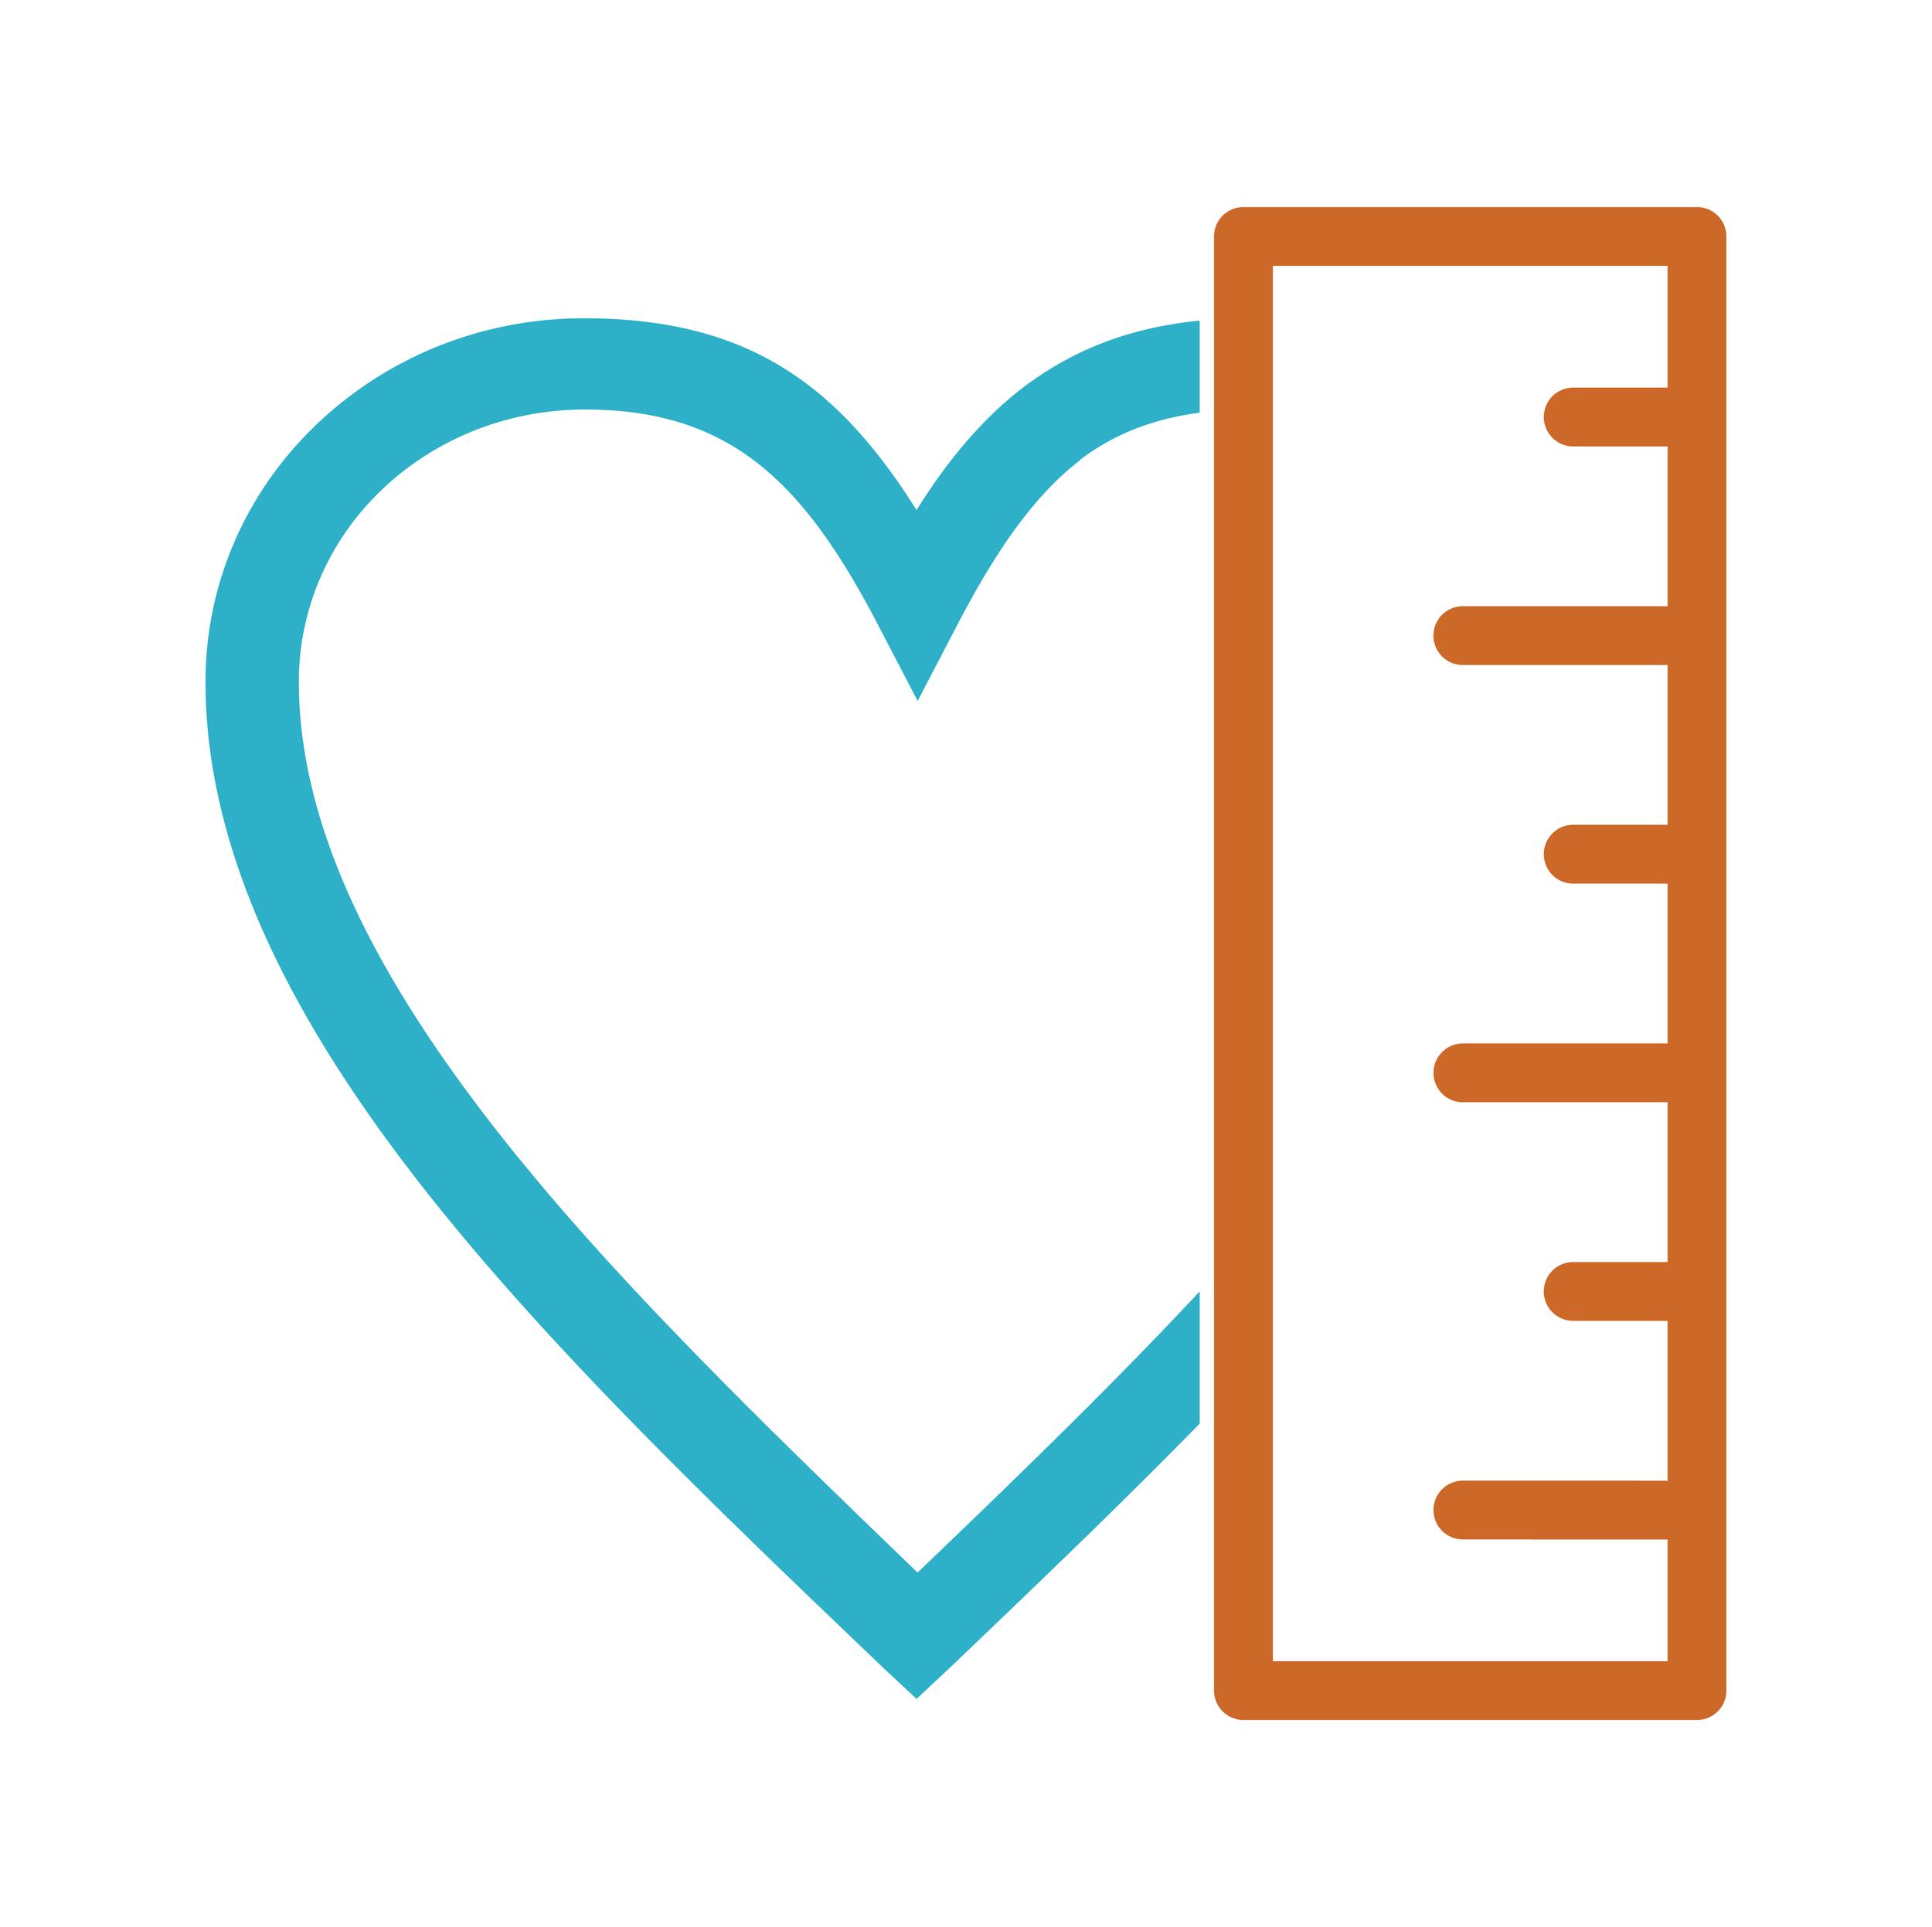 BHT-Measuring-Health-thumbnail-01.png